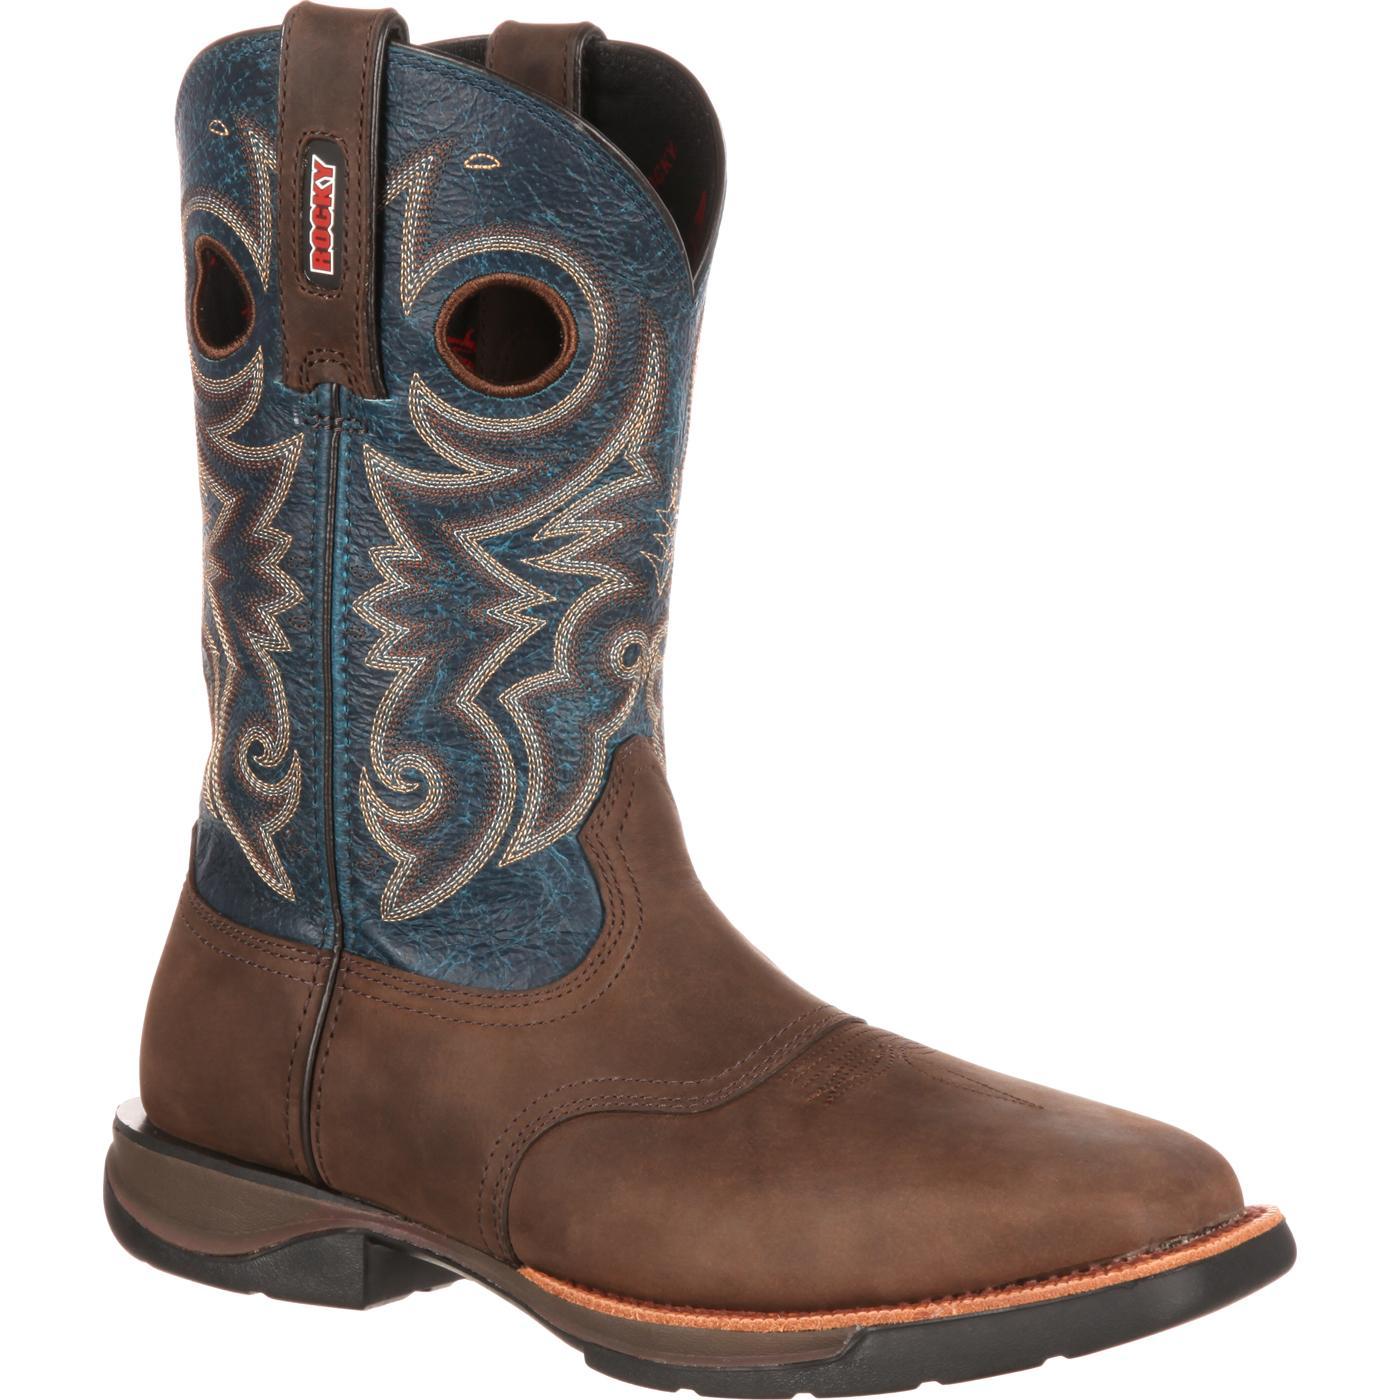 Rocky Lt Men39s Steel Toe Blue Brown Saddle Western Boot